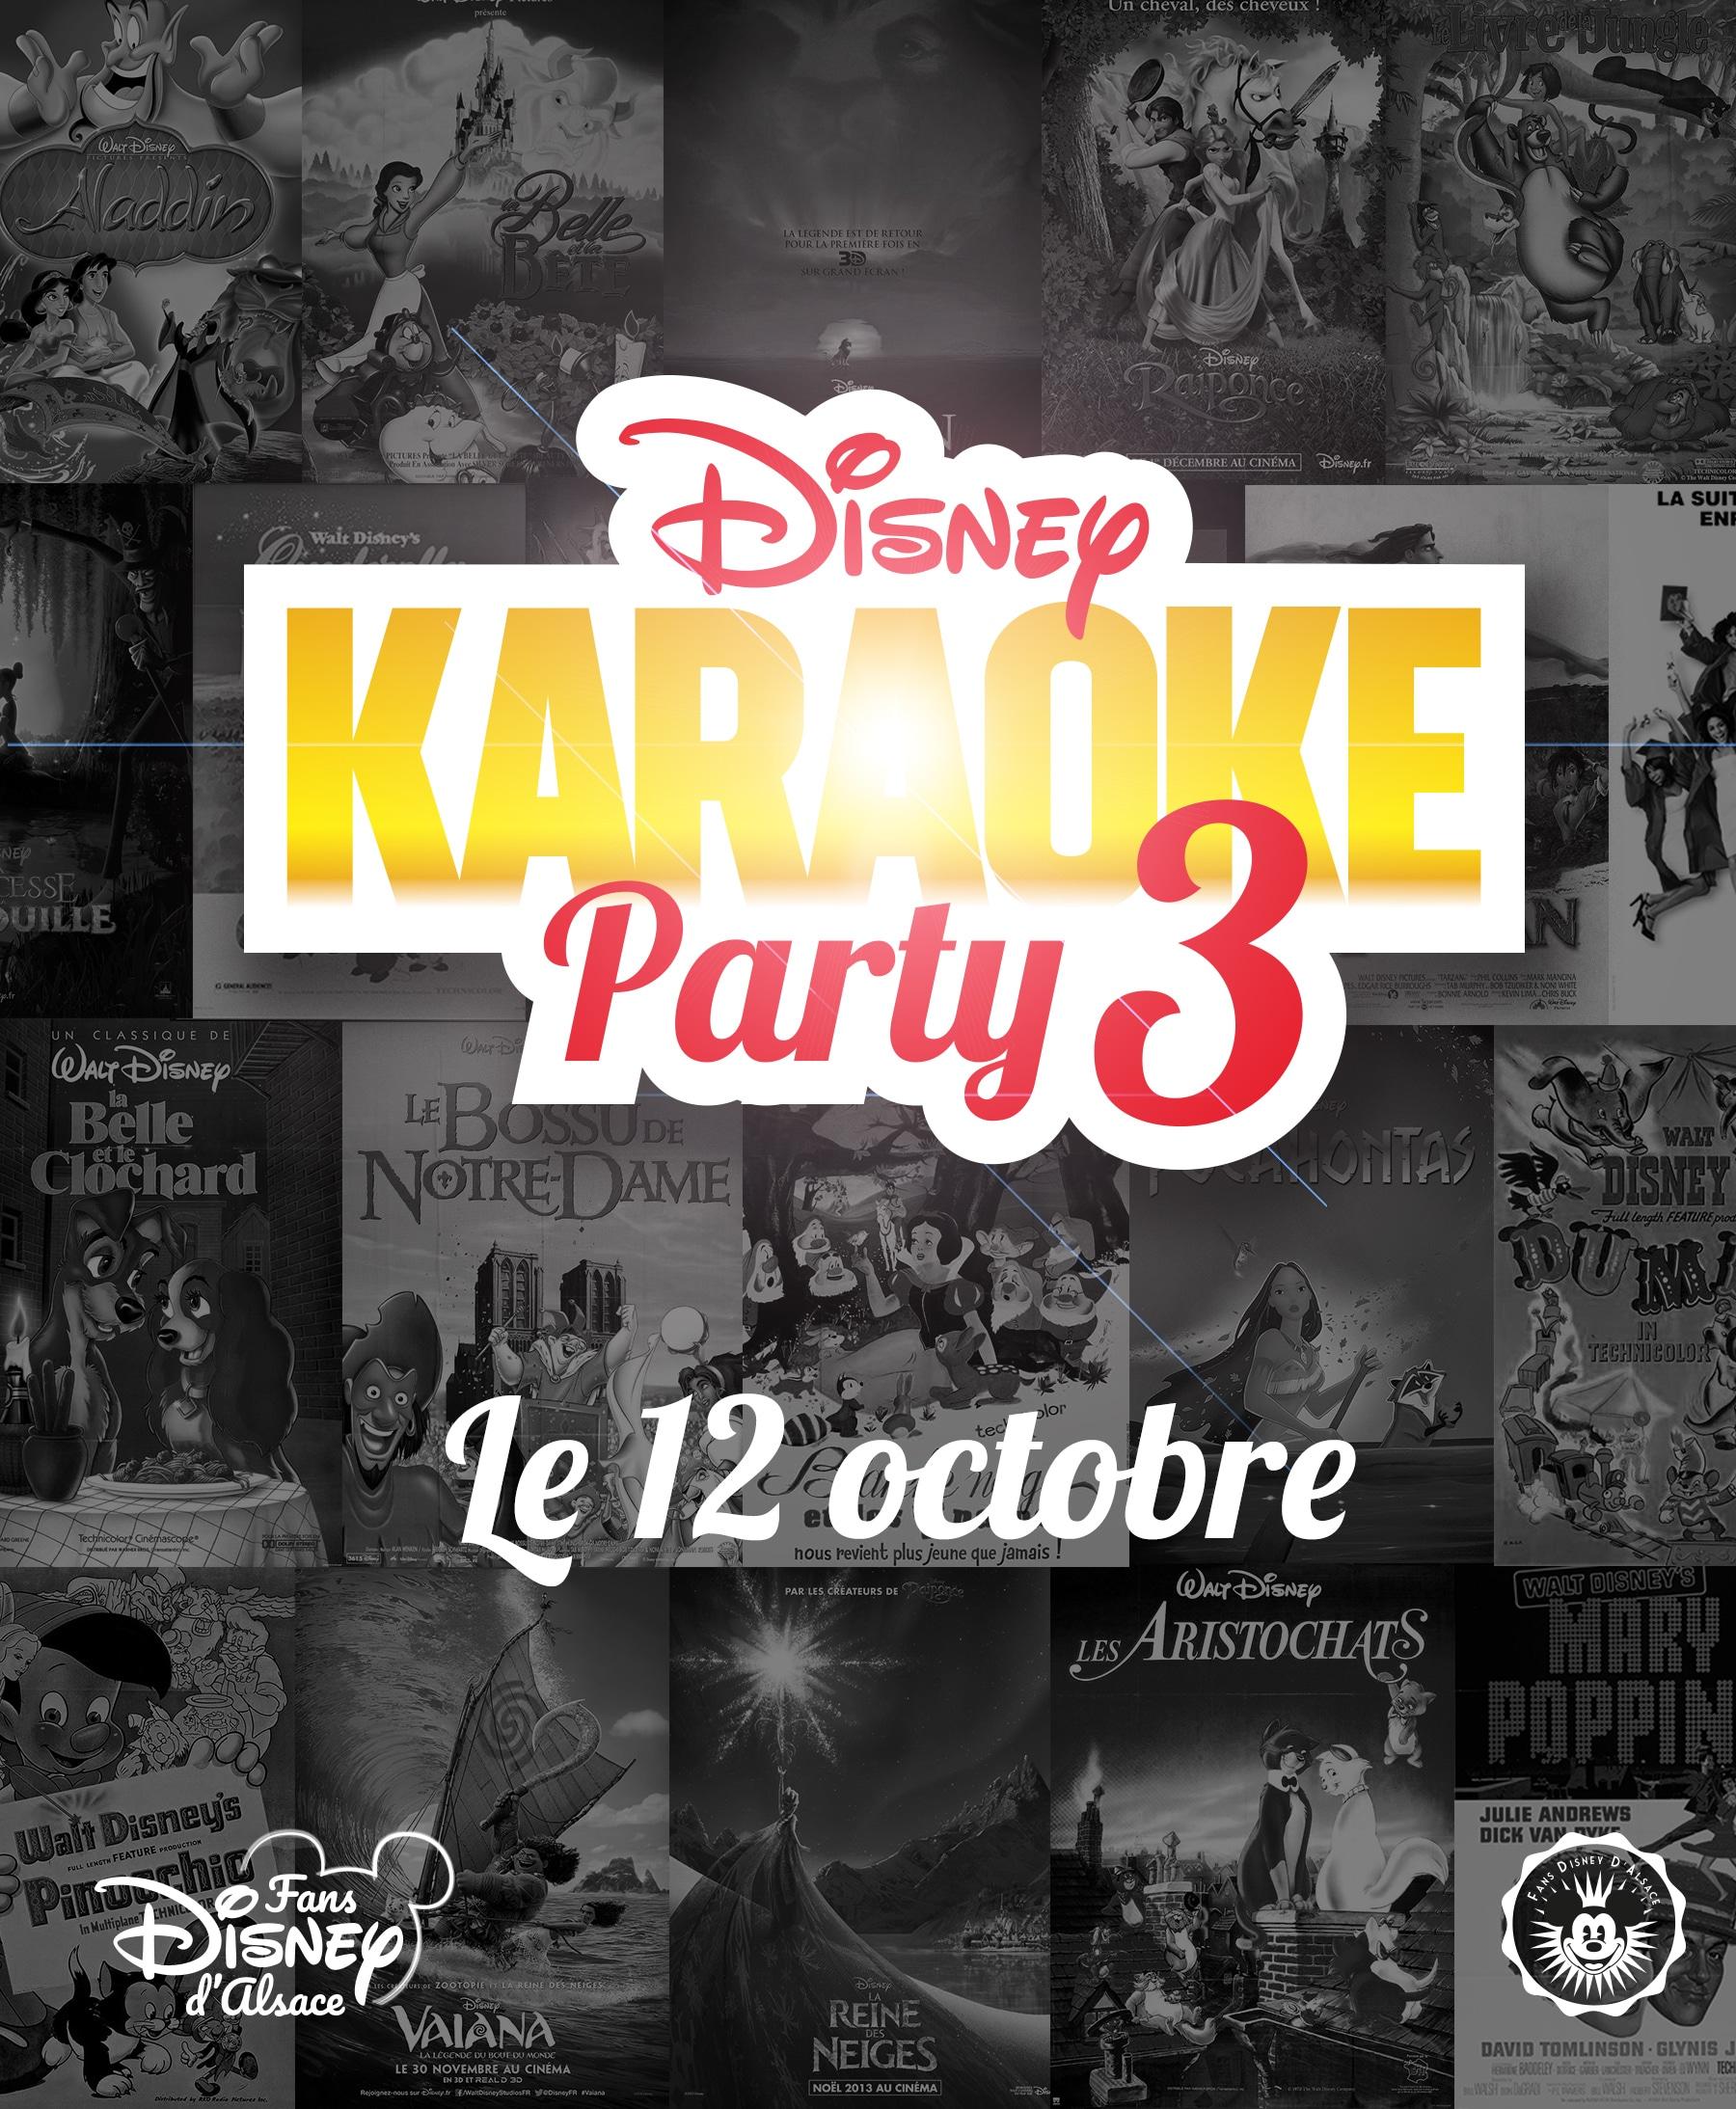 Disney Karaoke Party 3